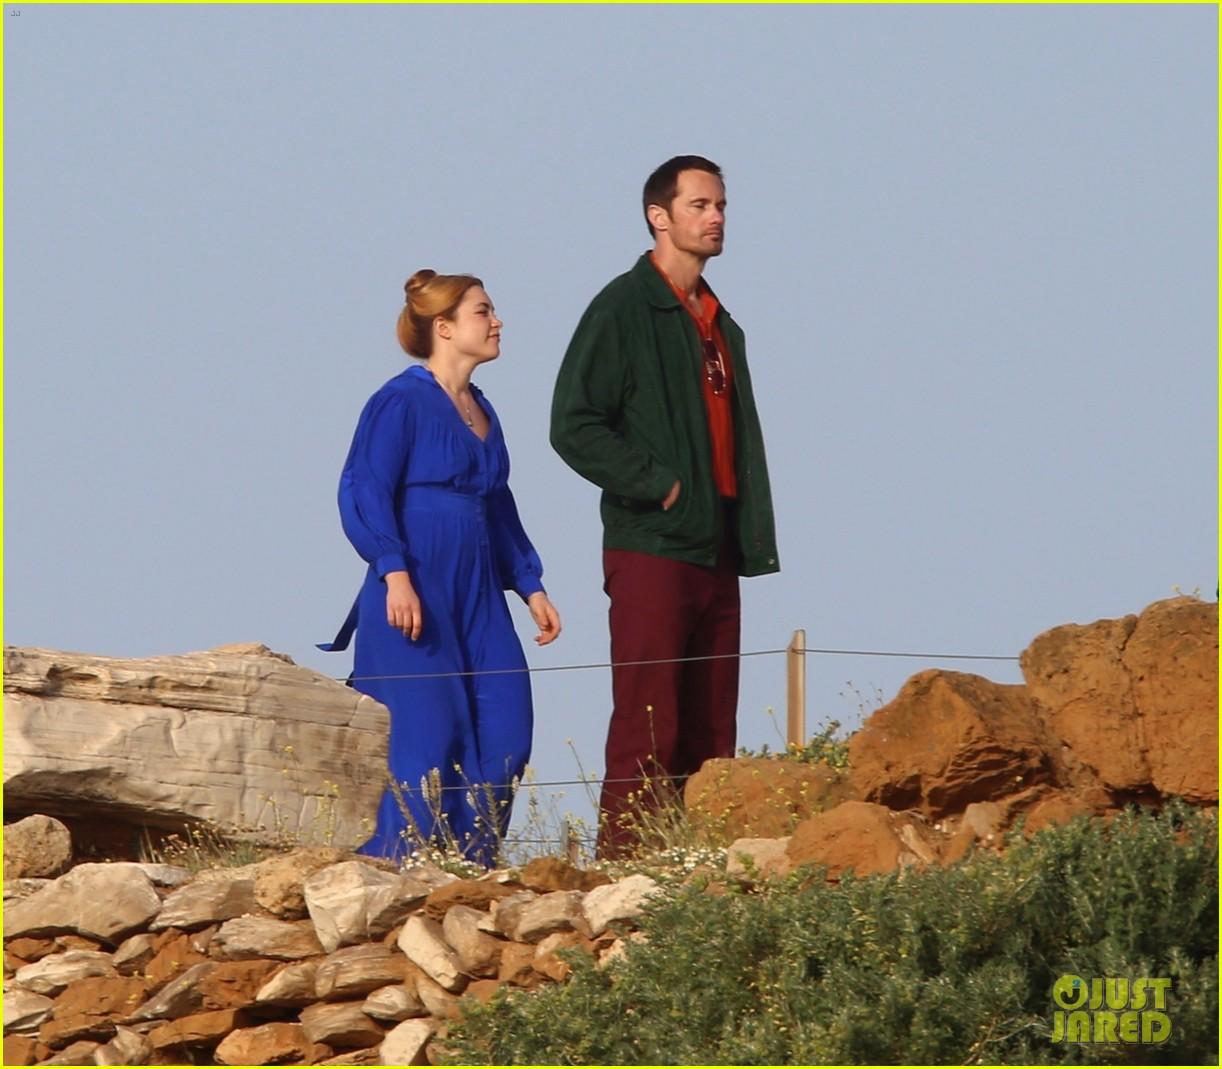 Florence Pugh Actor >> Alexander Skarsgard Begins Filming 'Little Drummer Girl